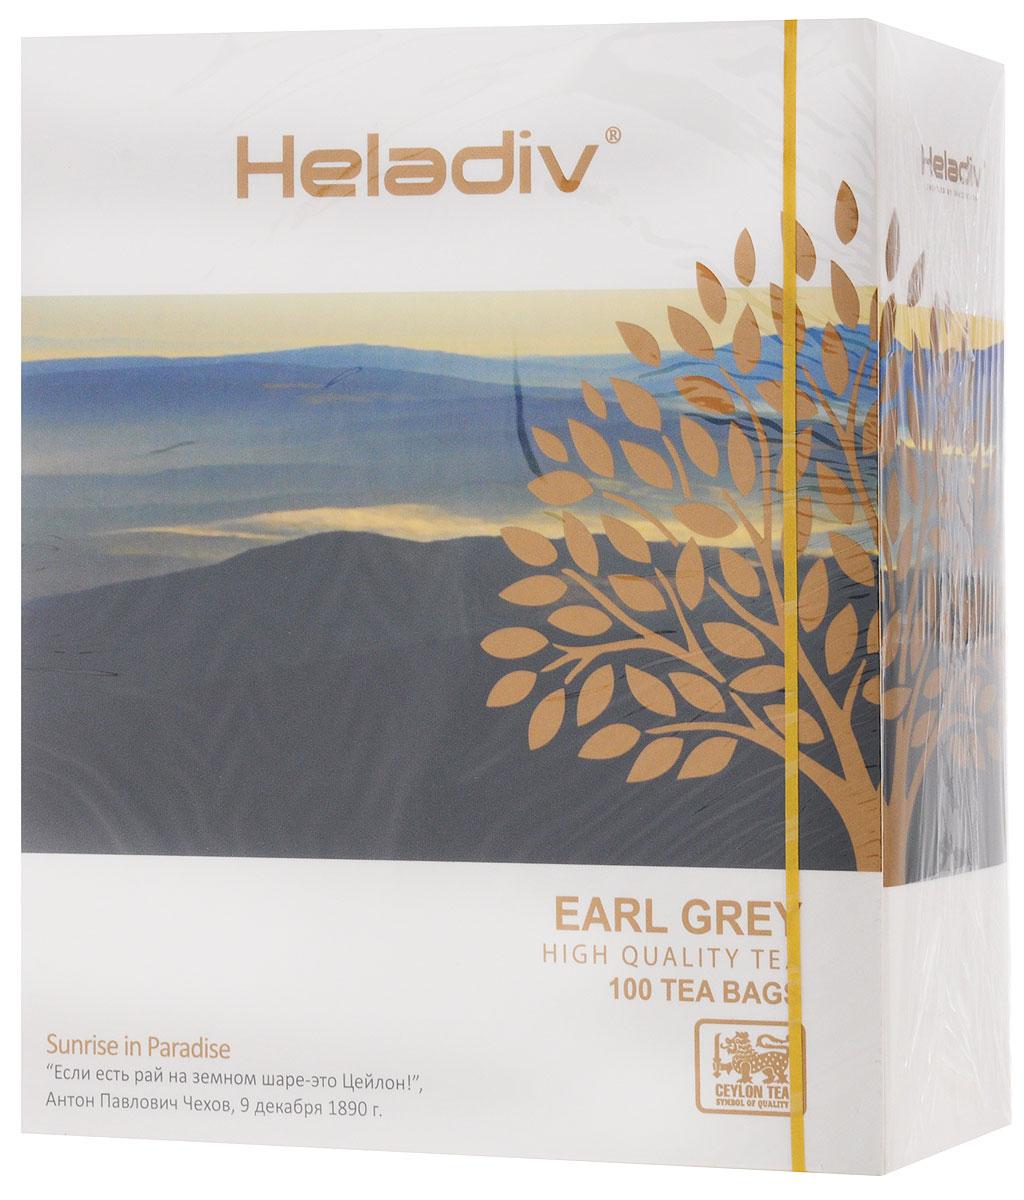 Heladiv Earl Grey чай черный с ароматом бергамота в пакетиках, 100 шт чай heladiv hd round p t blueberry 100 gr черный heladiv